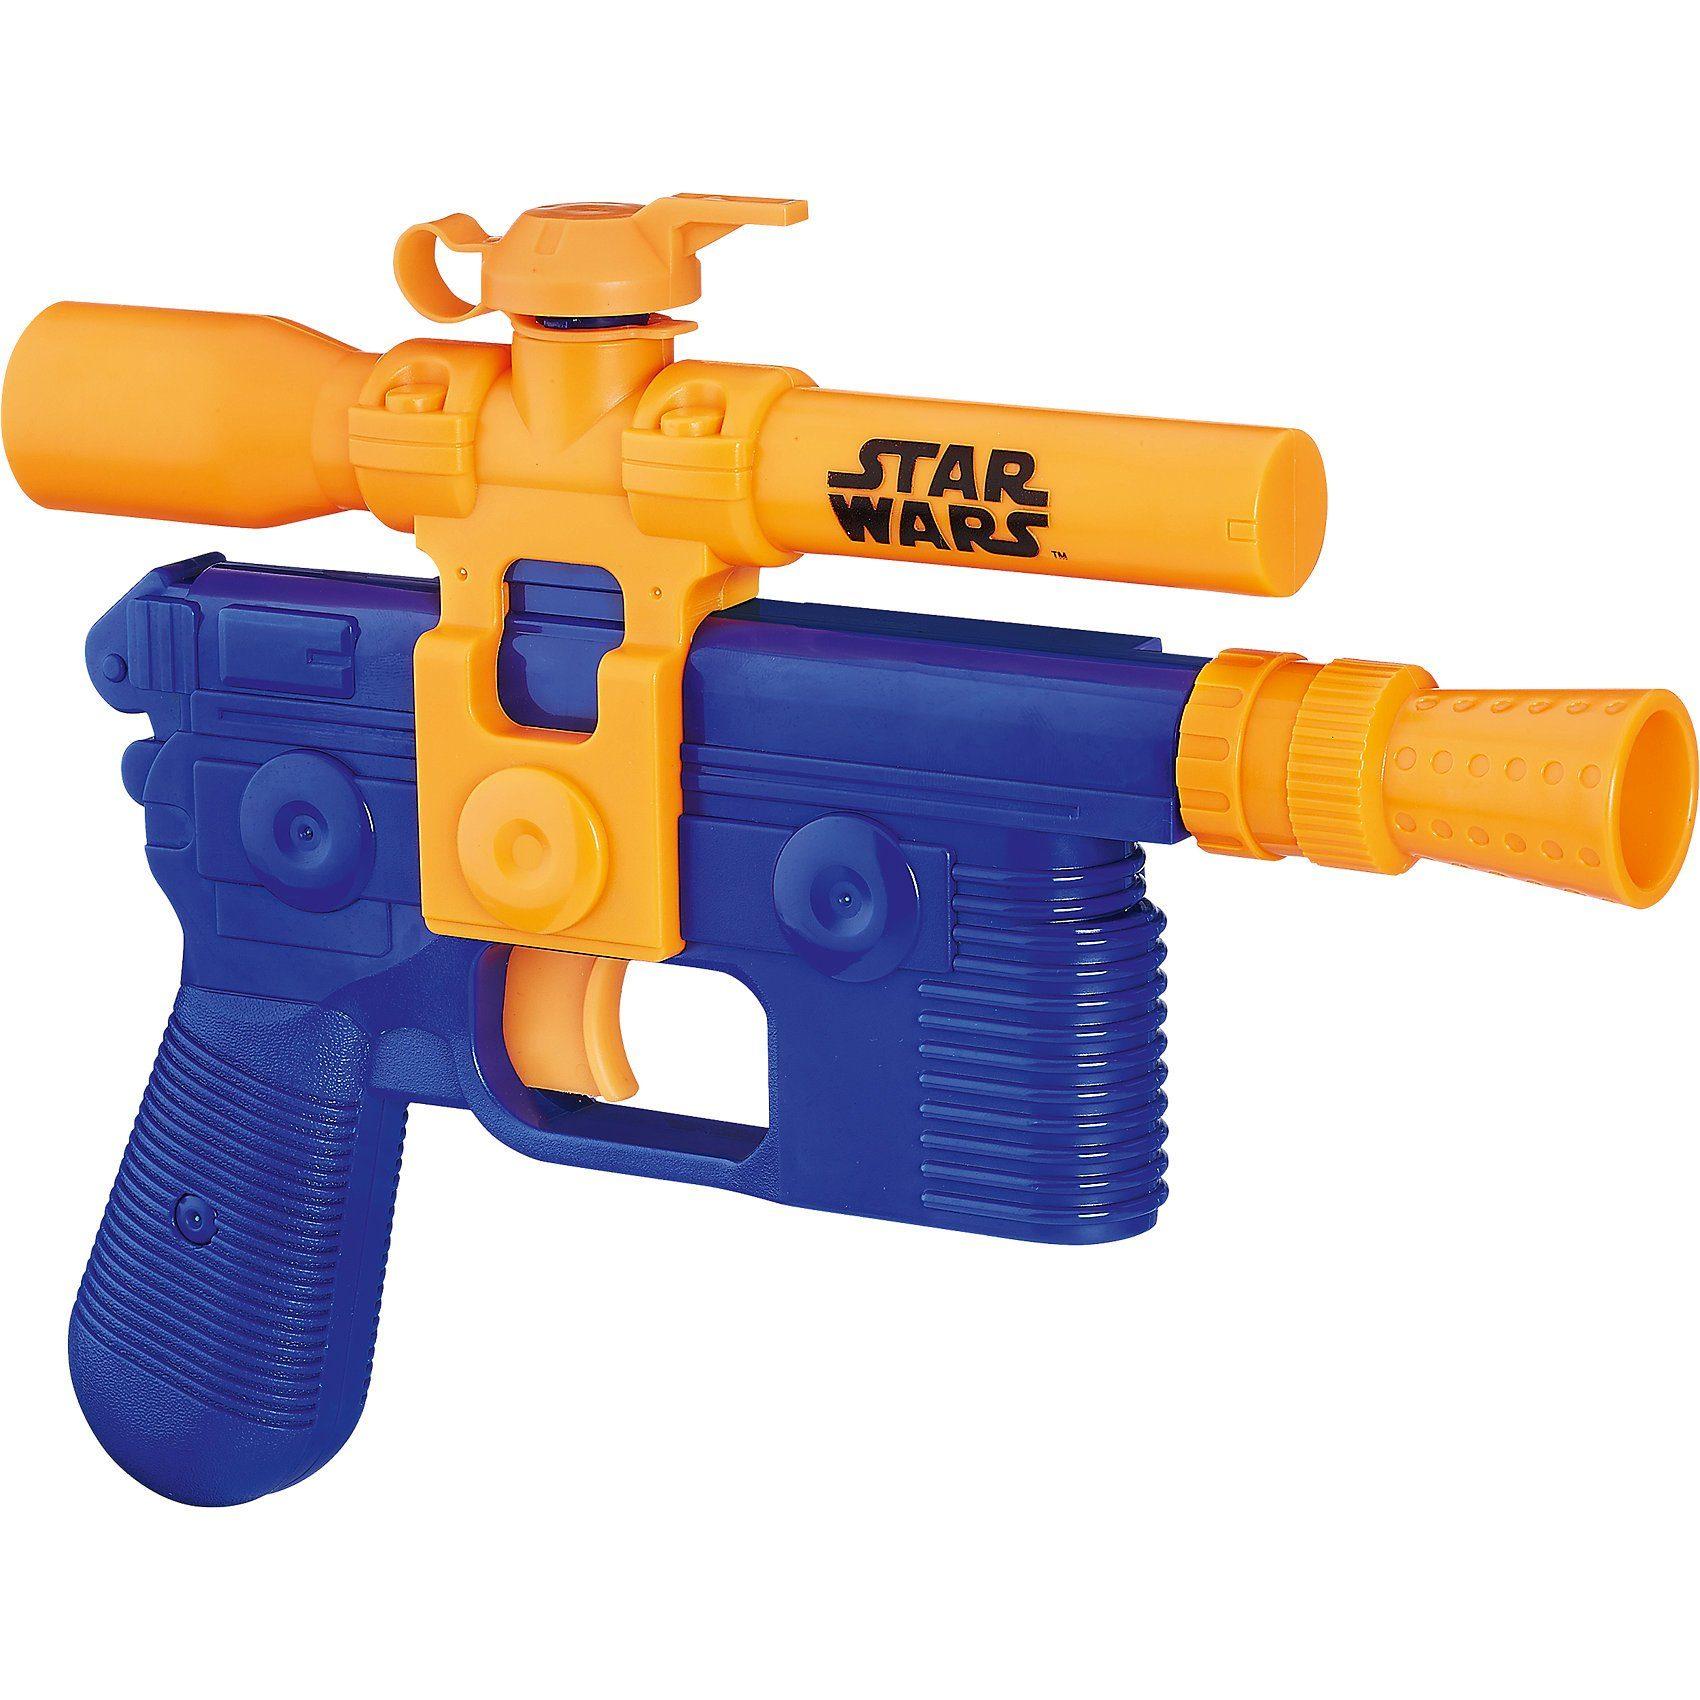 Hasbro Star Wars Super Soaker Han Solo Blaster